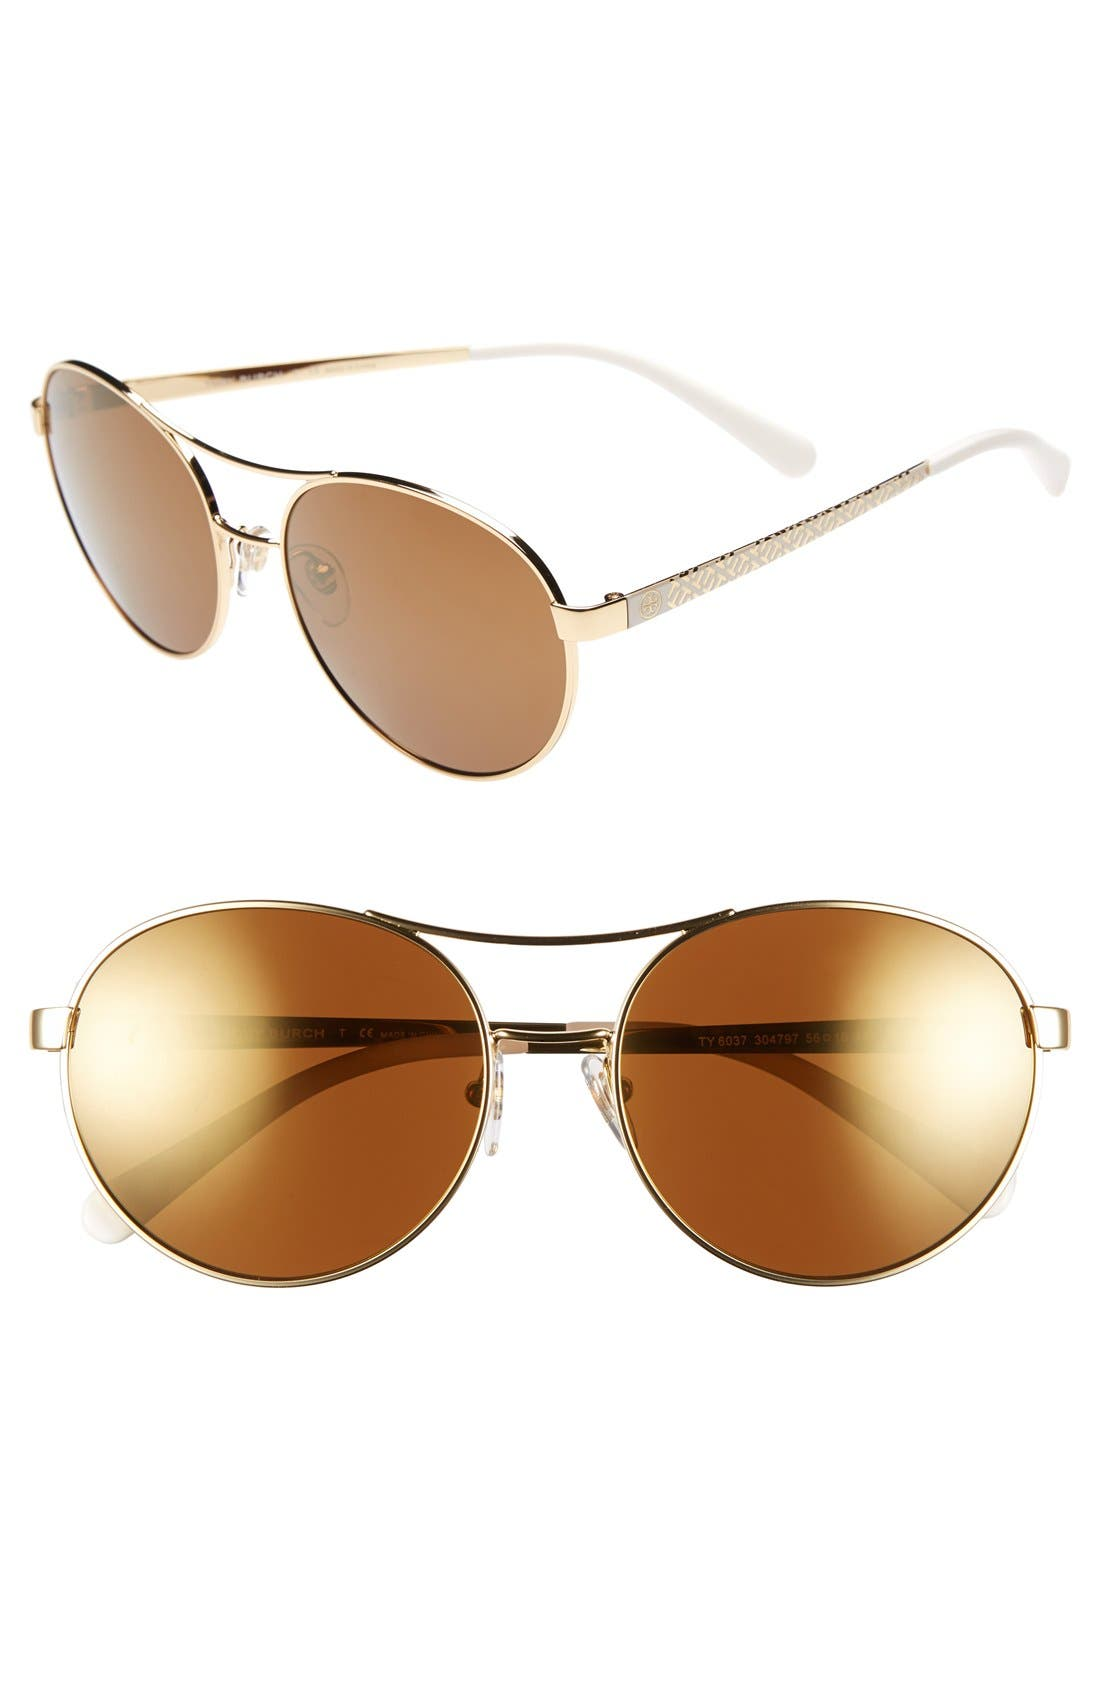 Alternate Image 1 Selected - Tory Burch 'M Round' 56mm Metal Sunglasses